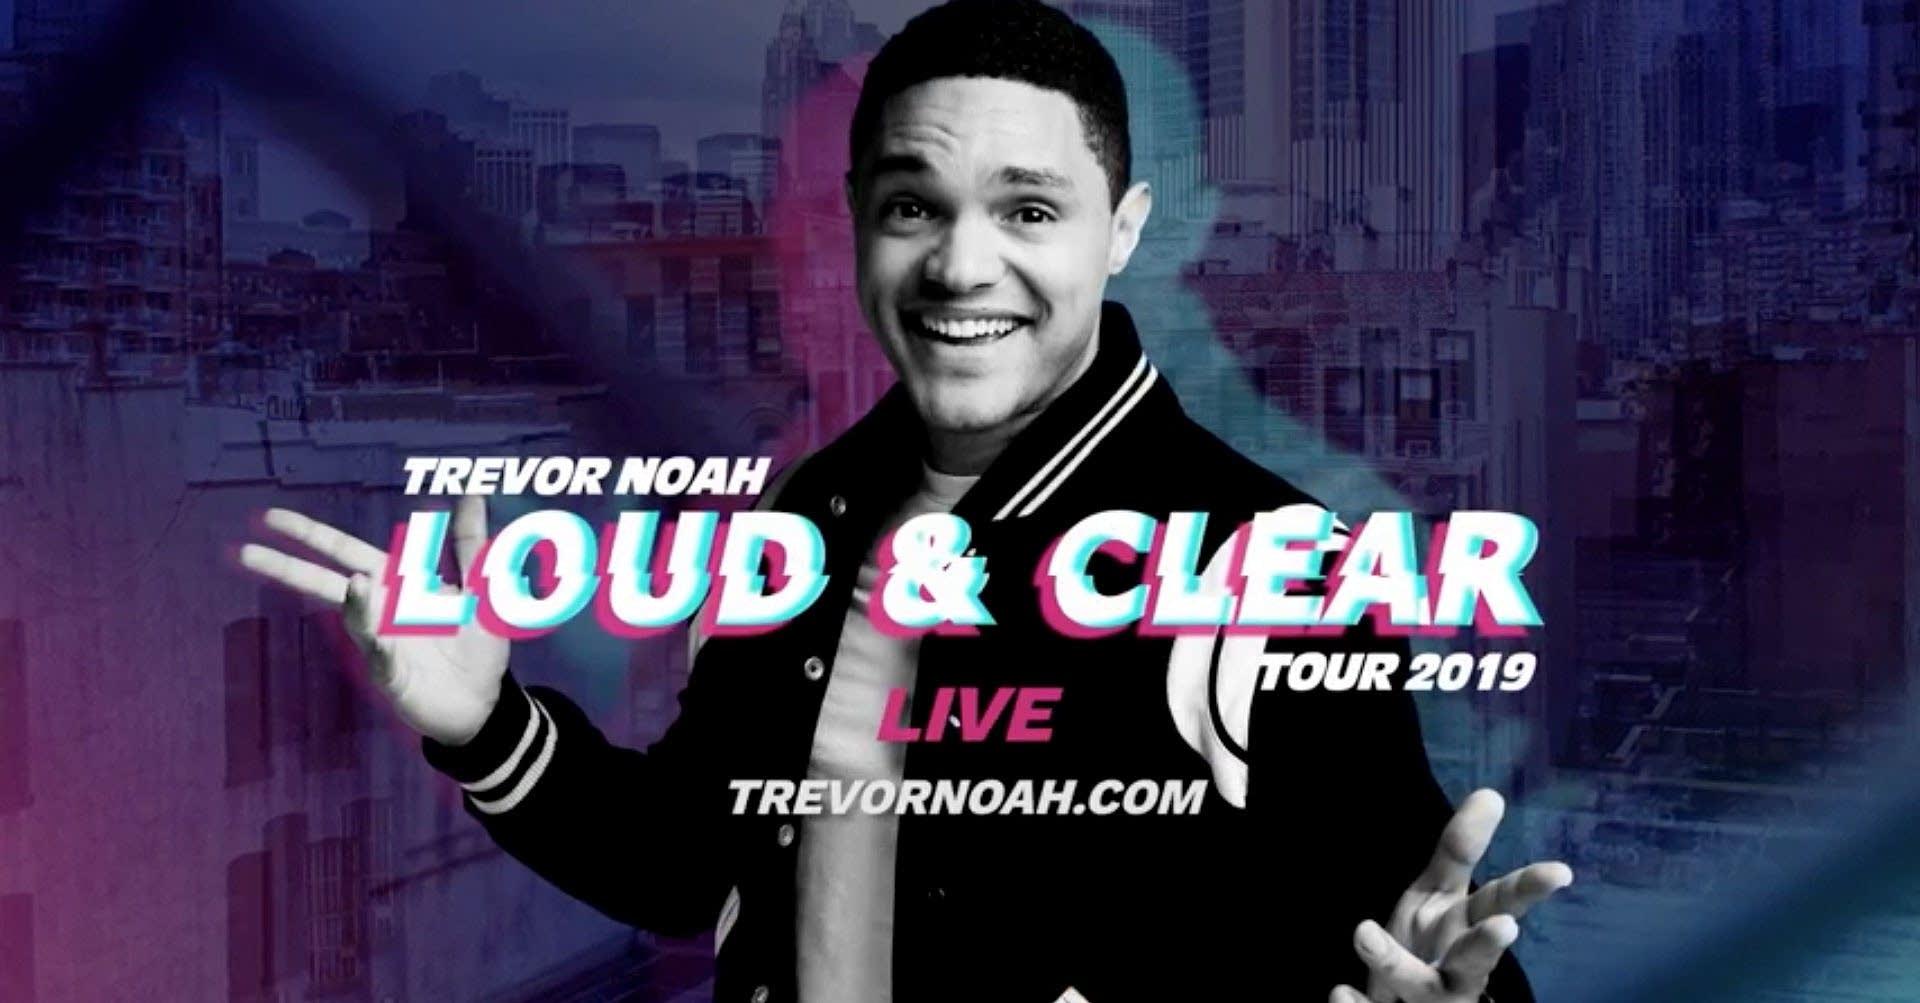 Trevor Noah Loud and Clear